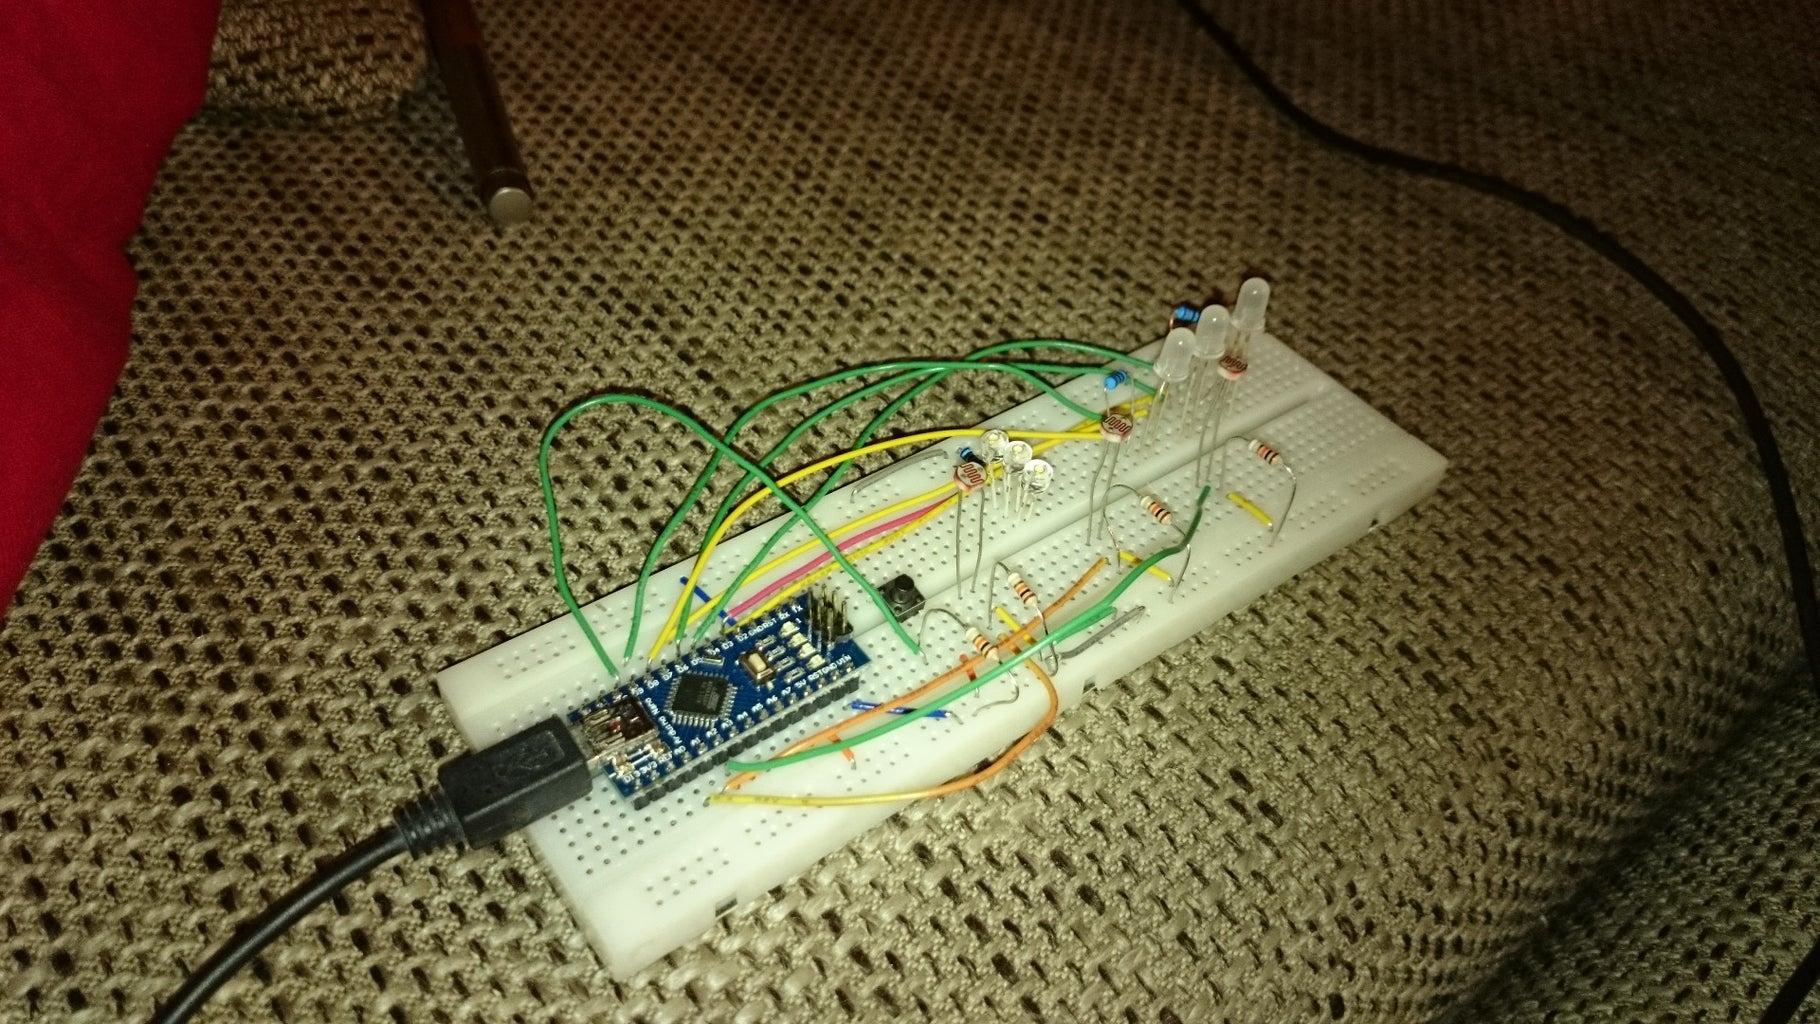 Building the FINISH (electronics)